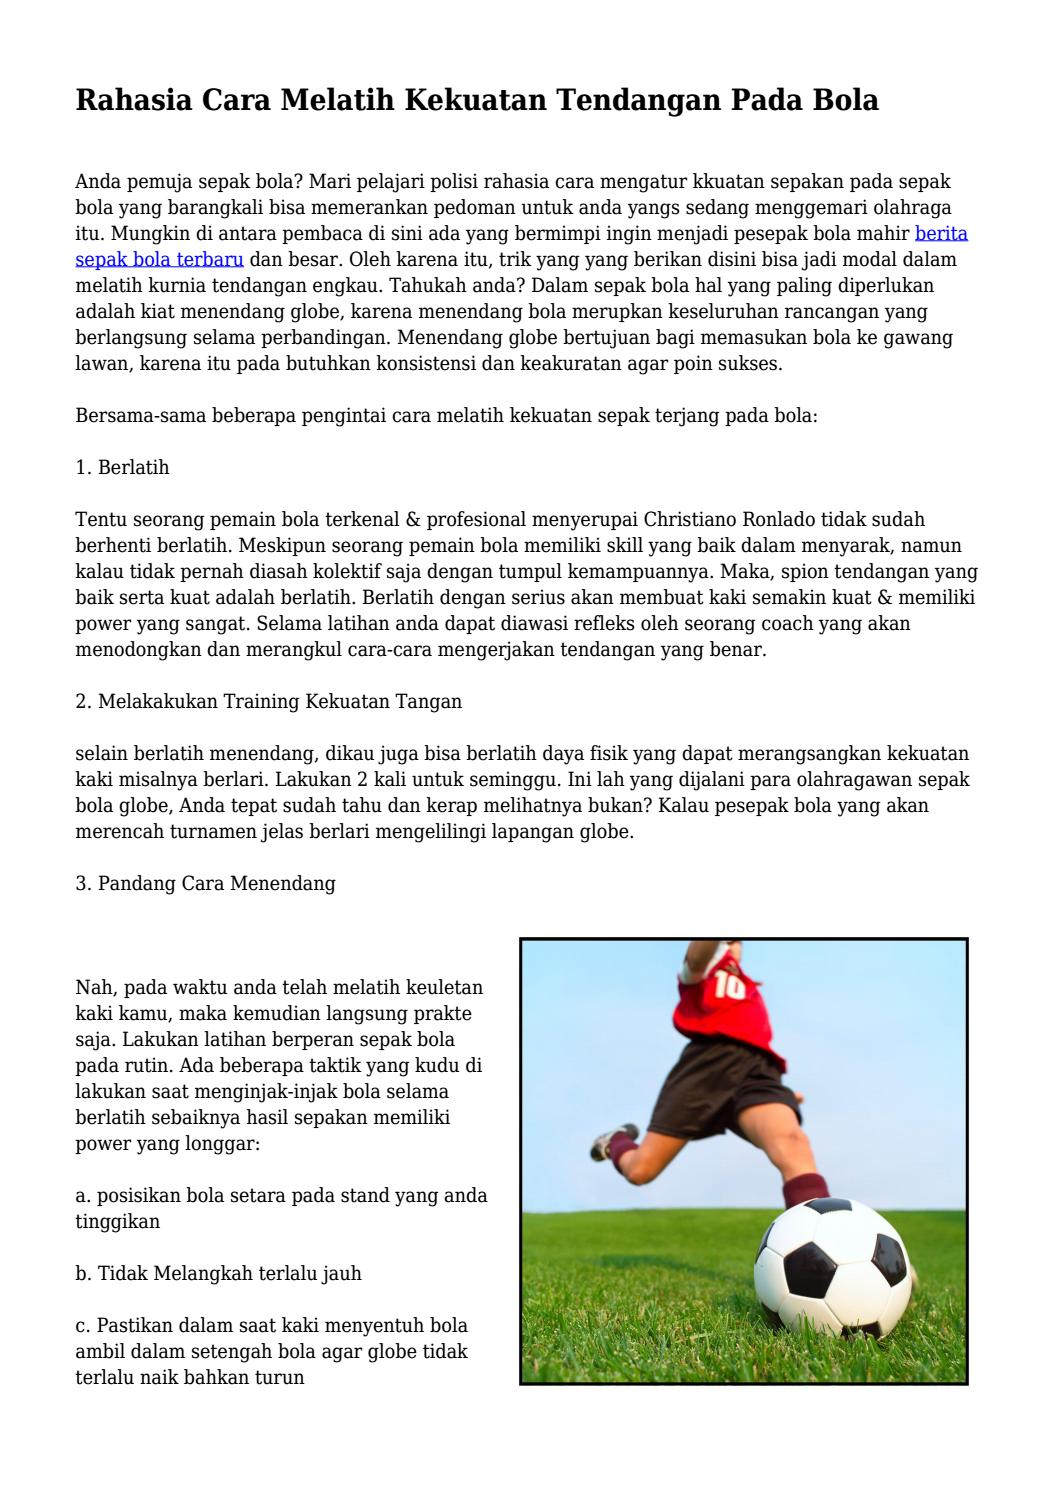 Tendangan Dalam Sepak Bola : tendangan, dalam, sepak, Rahasia, Melatih, Kekuatan, Tendangan, Klikgayahidupnet, Issuu